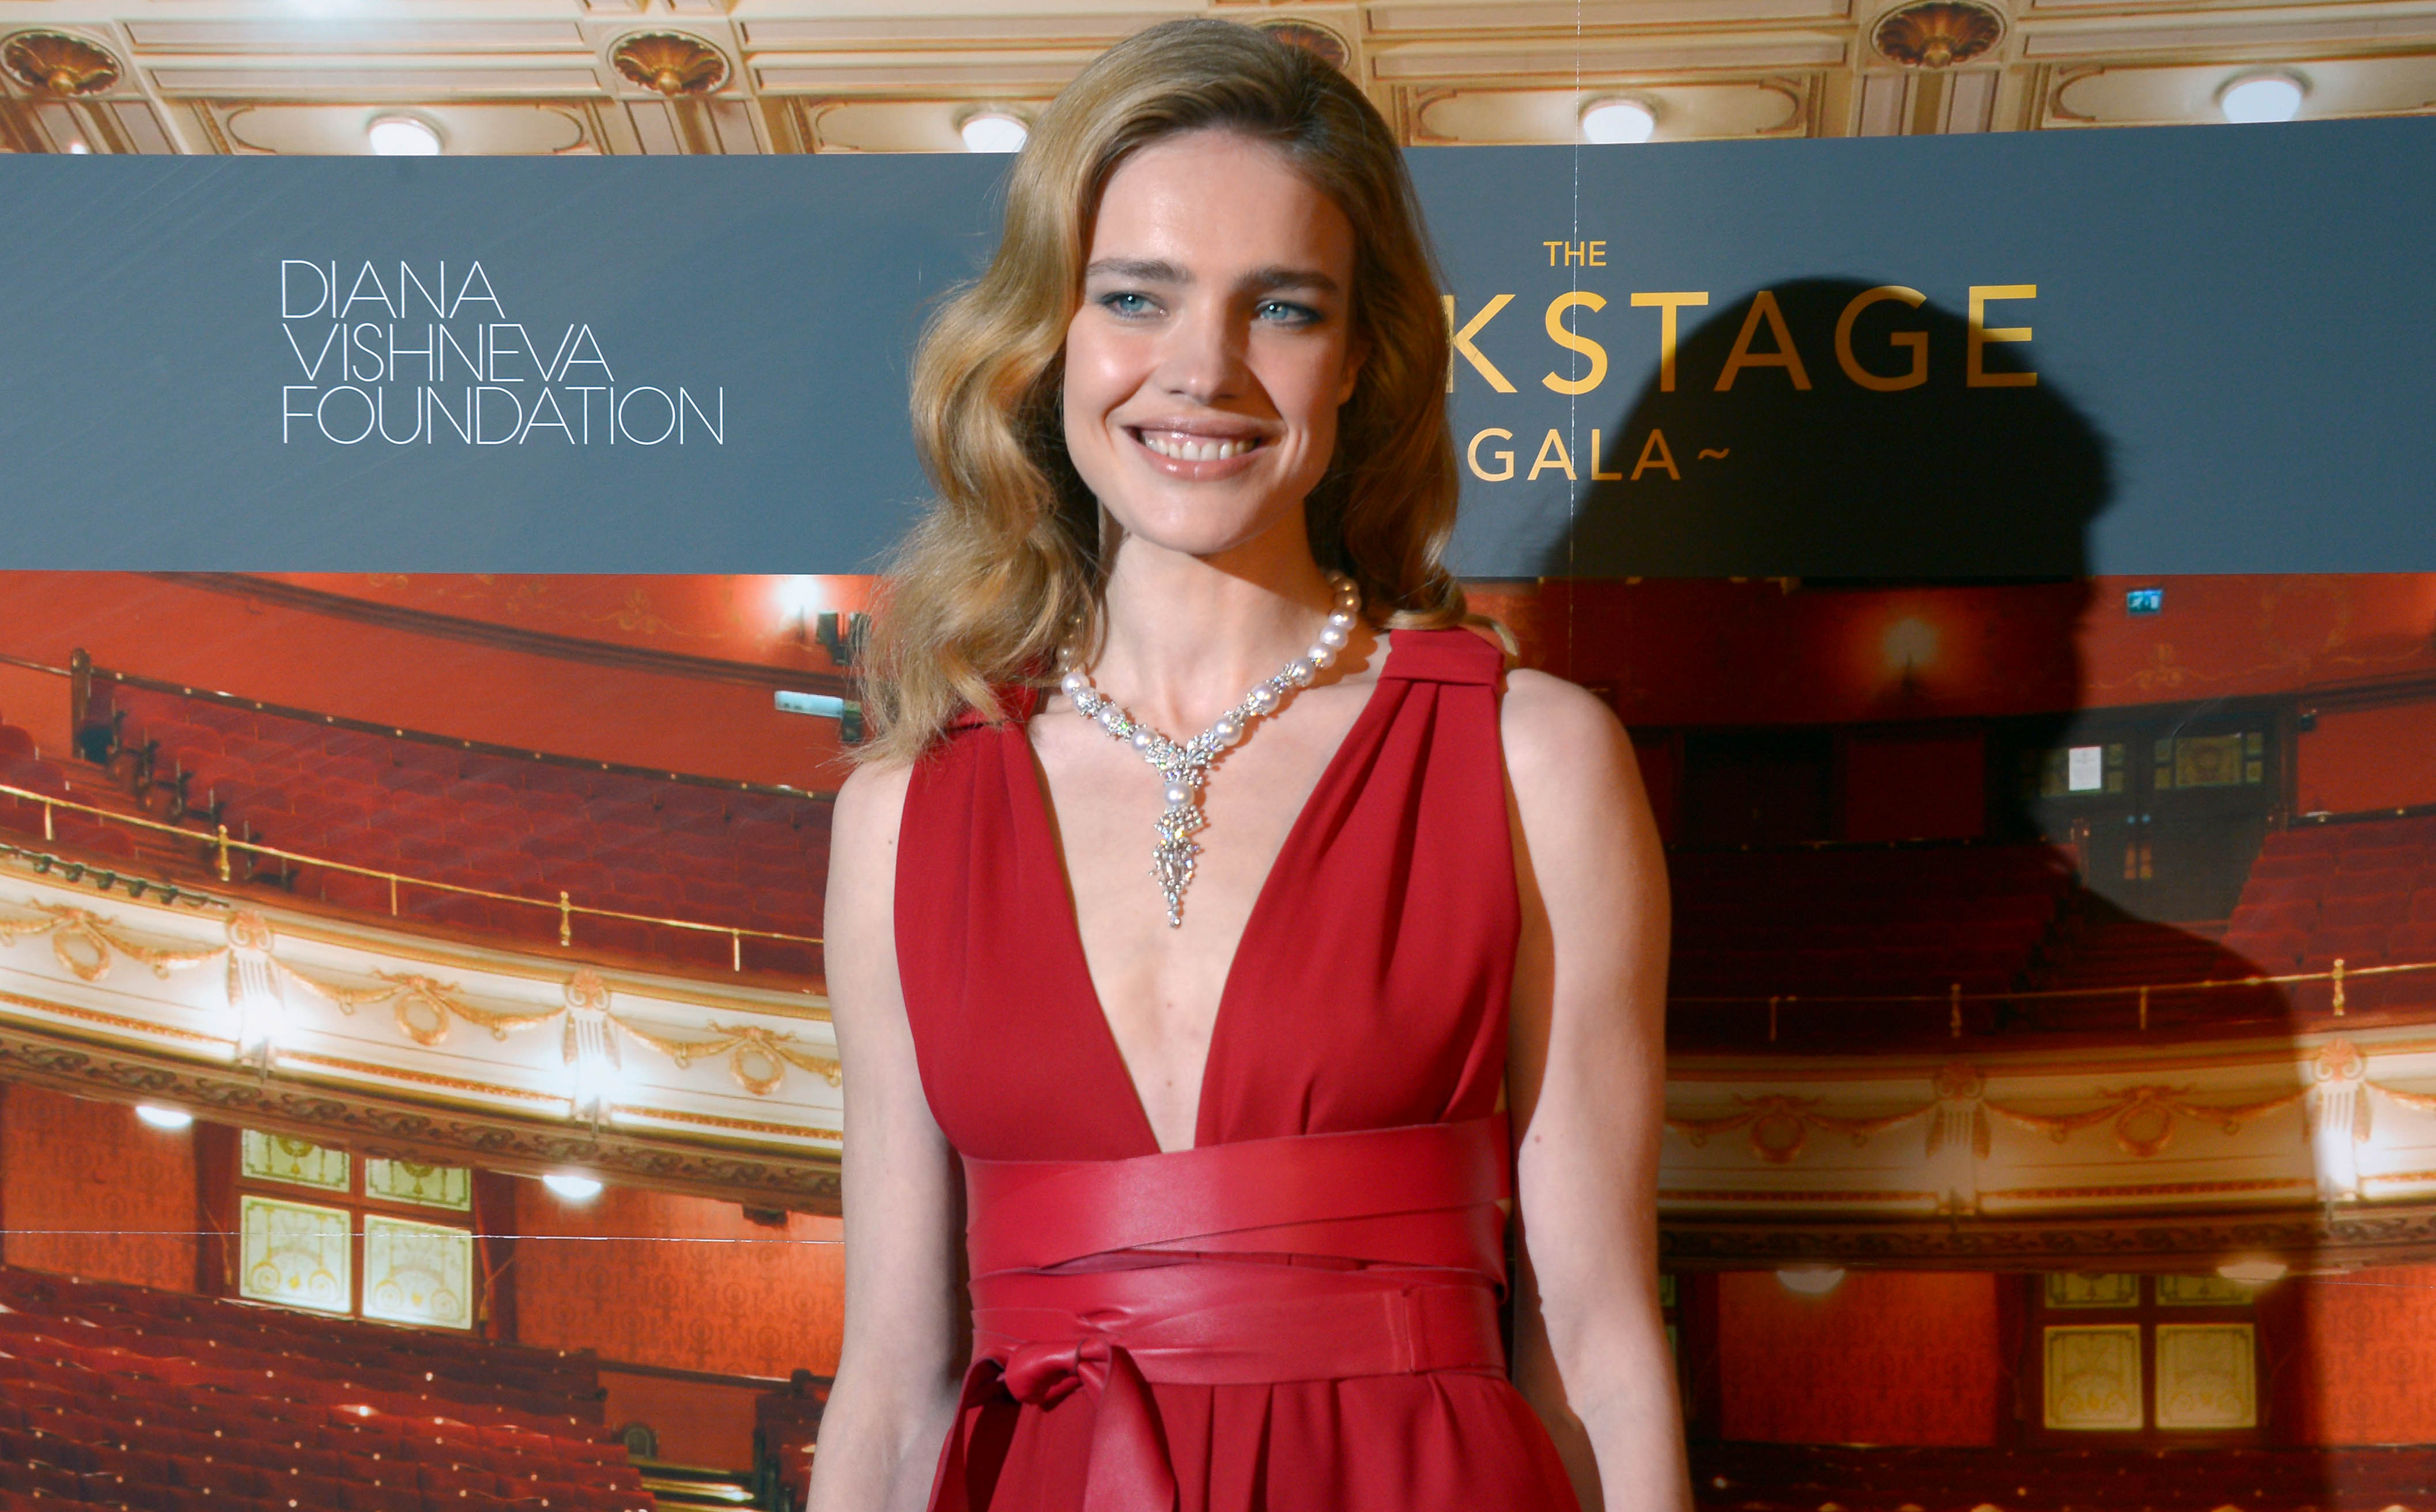 The Backstage Gala - Red Carpet Arrivals